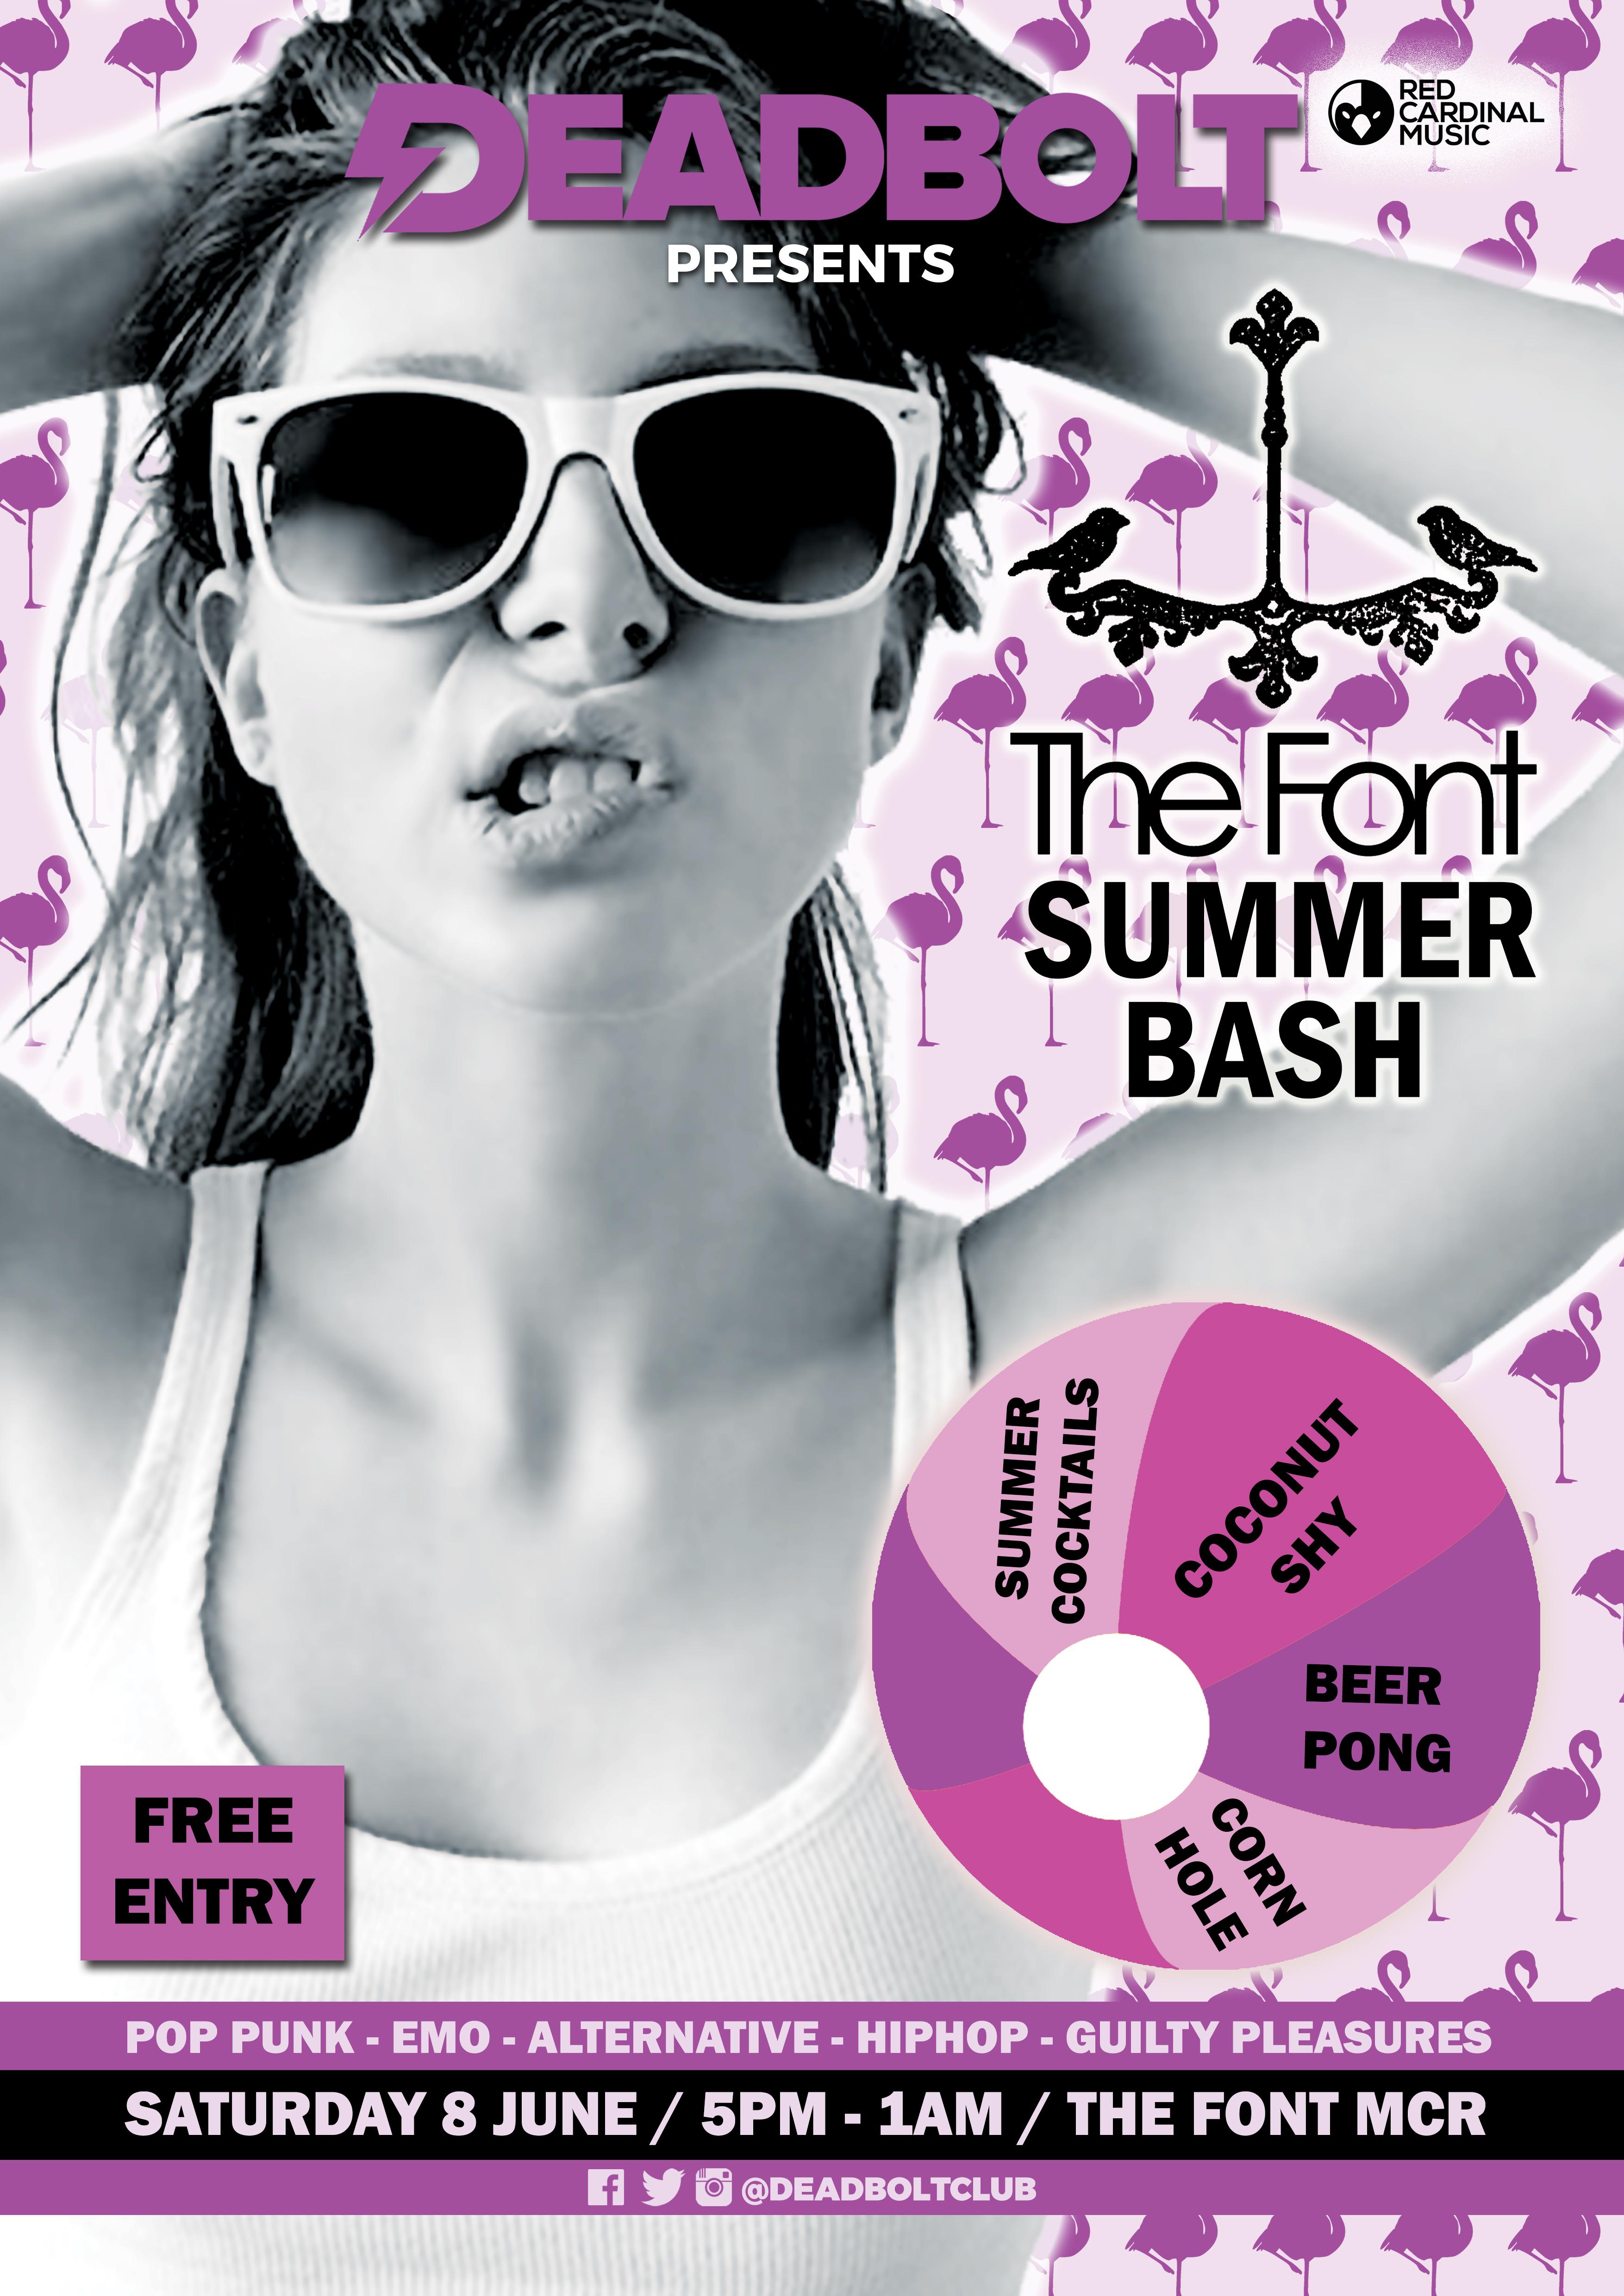 Deadbolt Manchester - Summer Party - Font - 08 June - RGB For Web